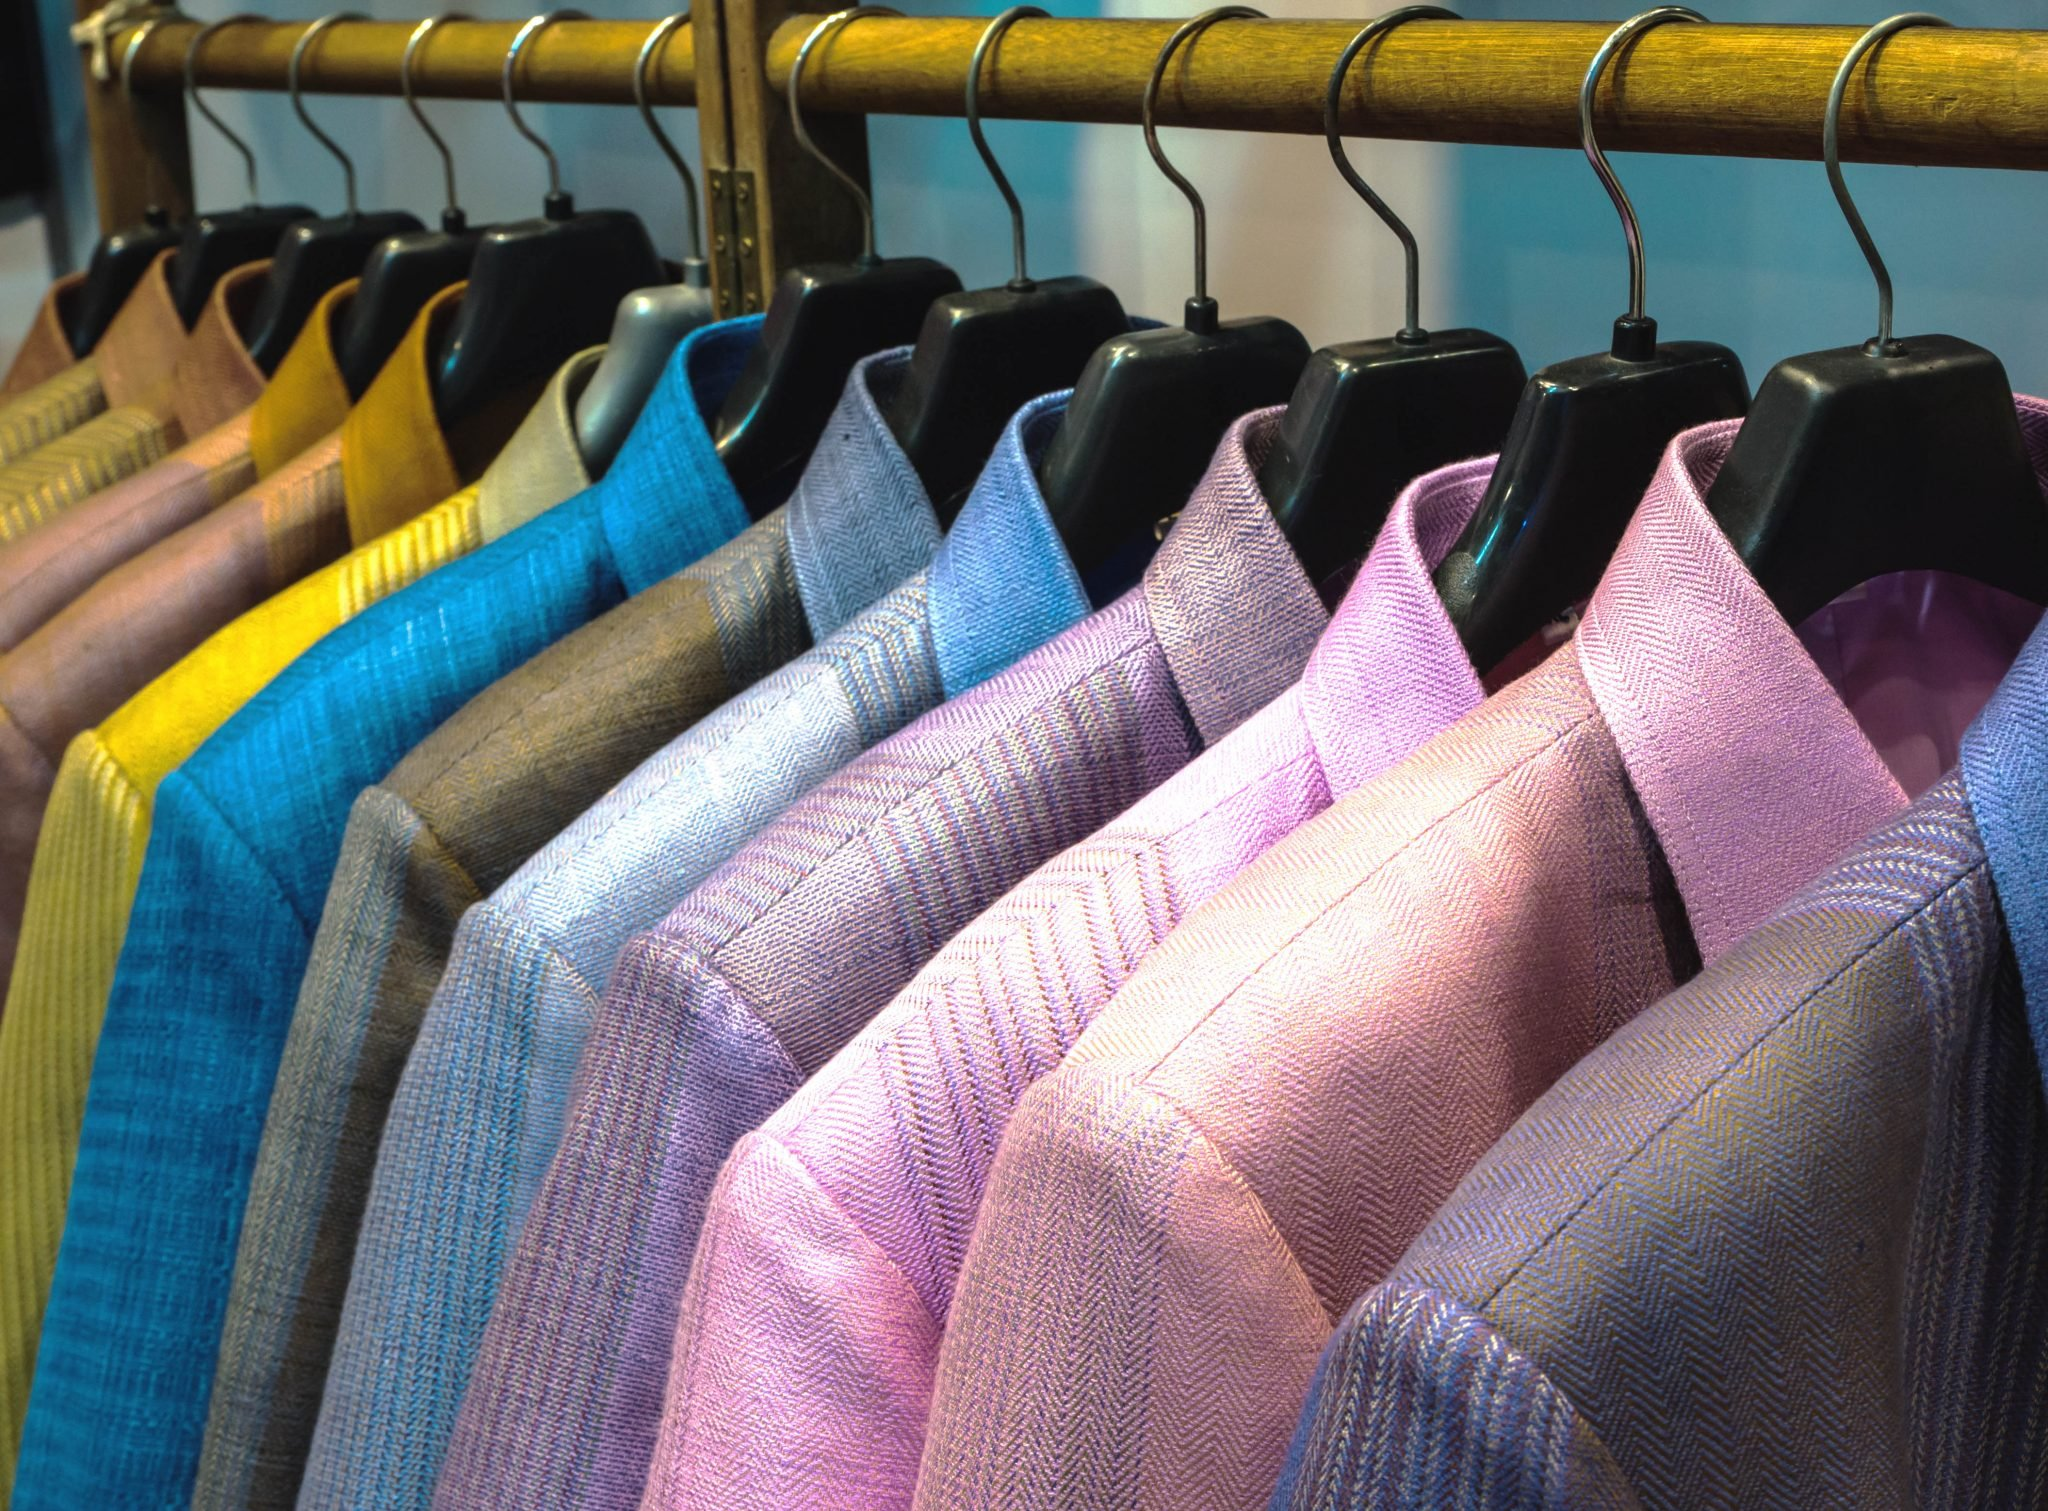 Thailand silk shirt hanging on a clothesline